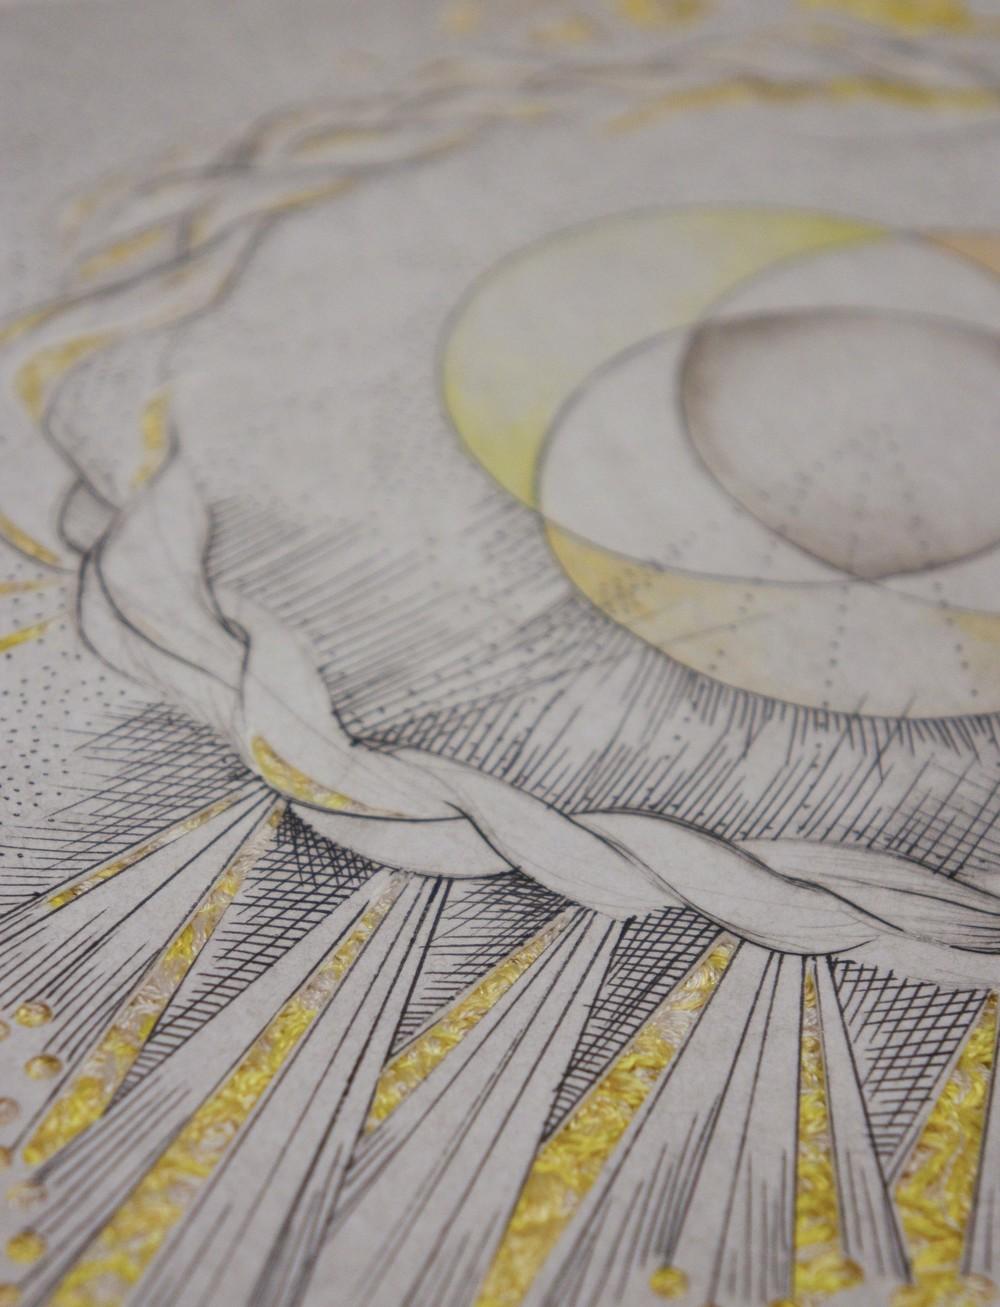 oldprintsnewlife_fiber_ink_engraving